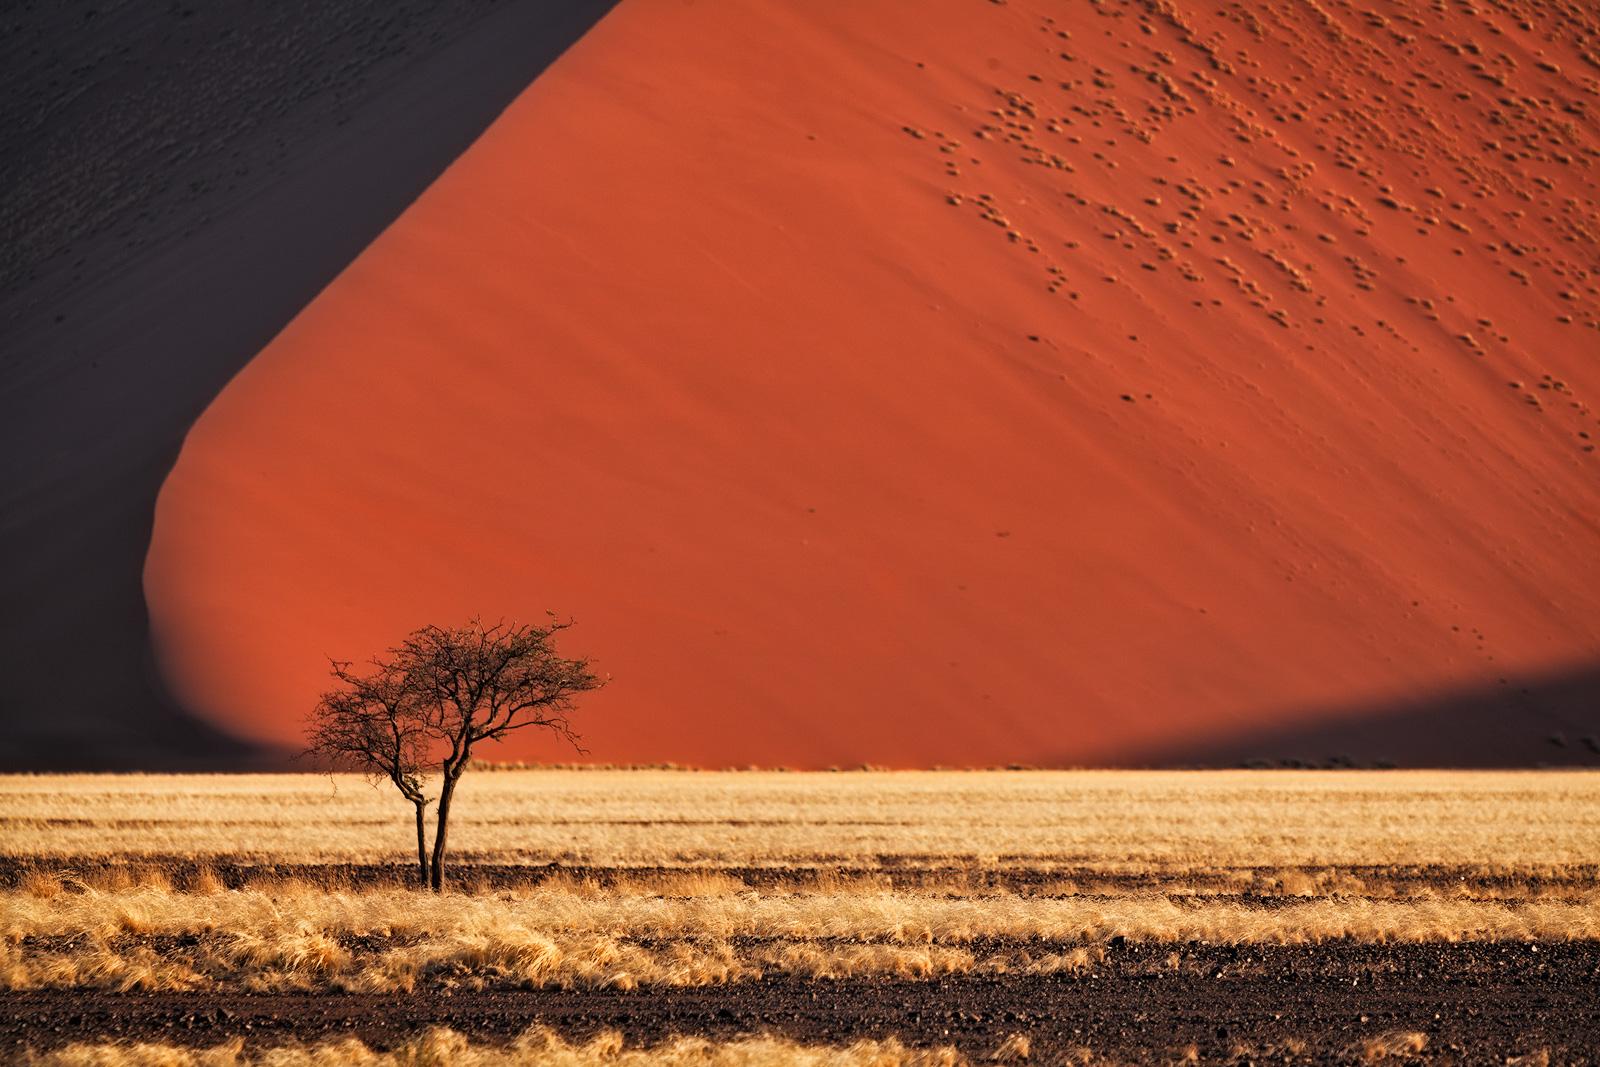 africa,african,desert,dune,horizontal,namibia,namibian,orange,sand, photo